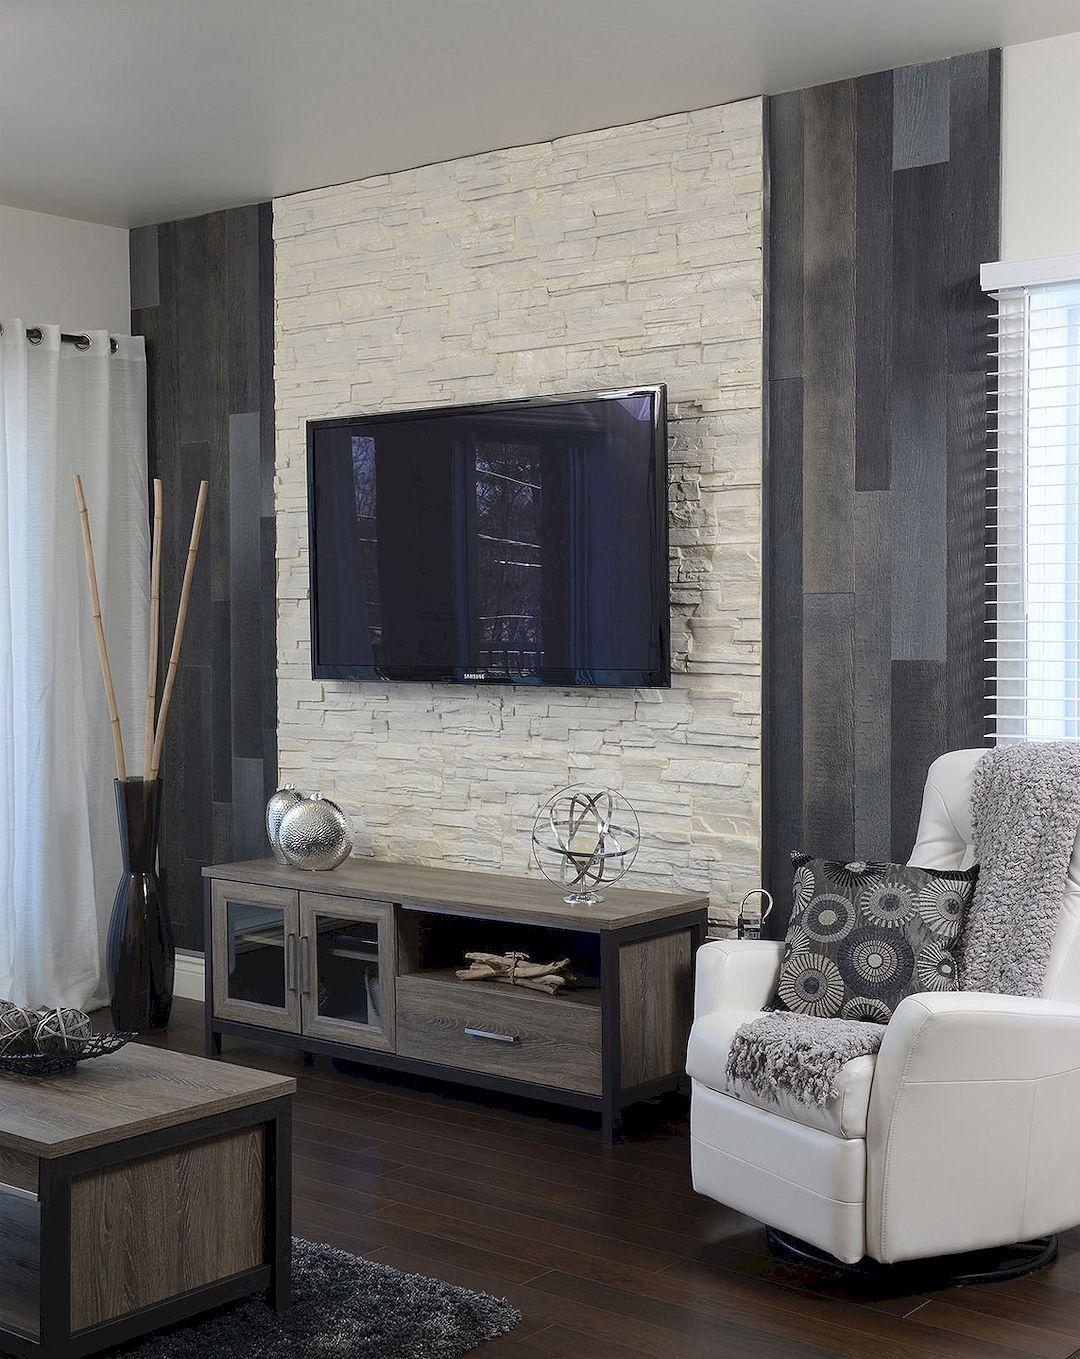 Popular Interior Design For Tv Showcase: Unconventional Interior Home Designs